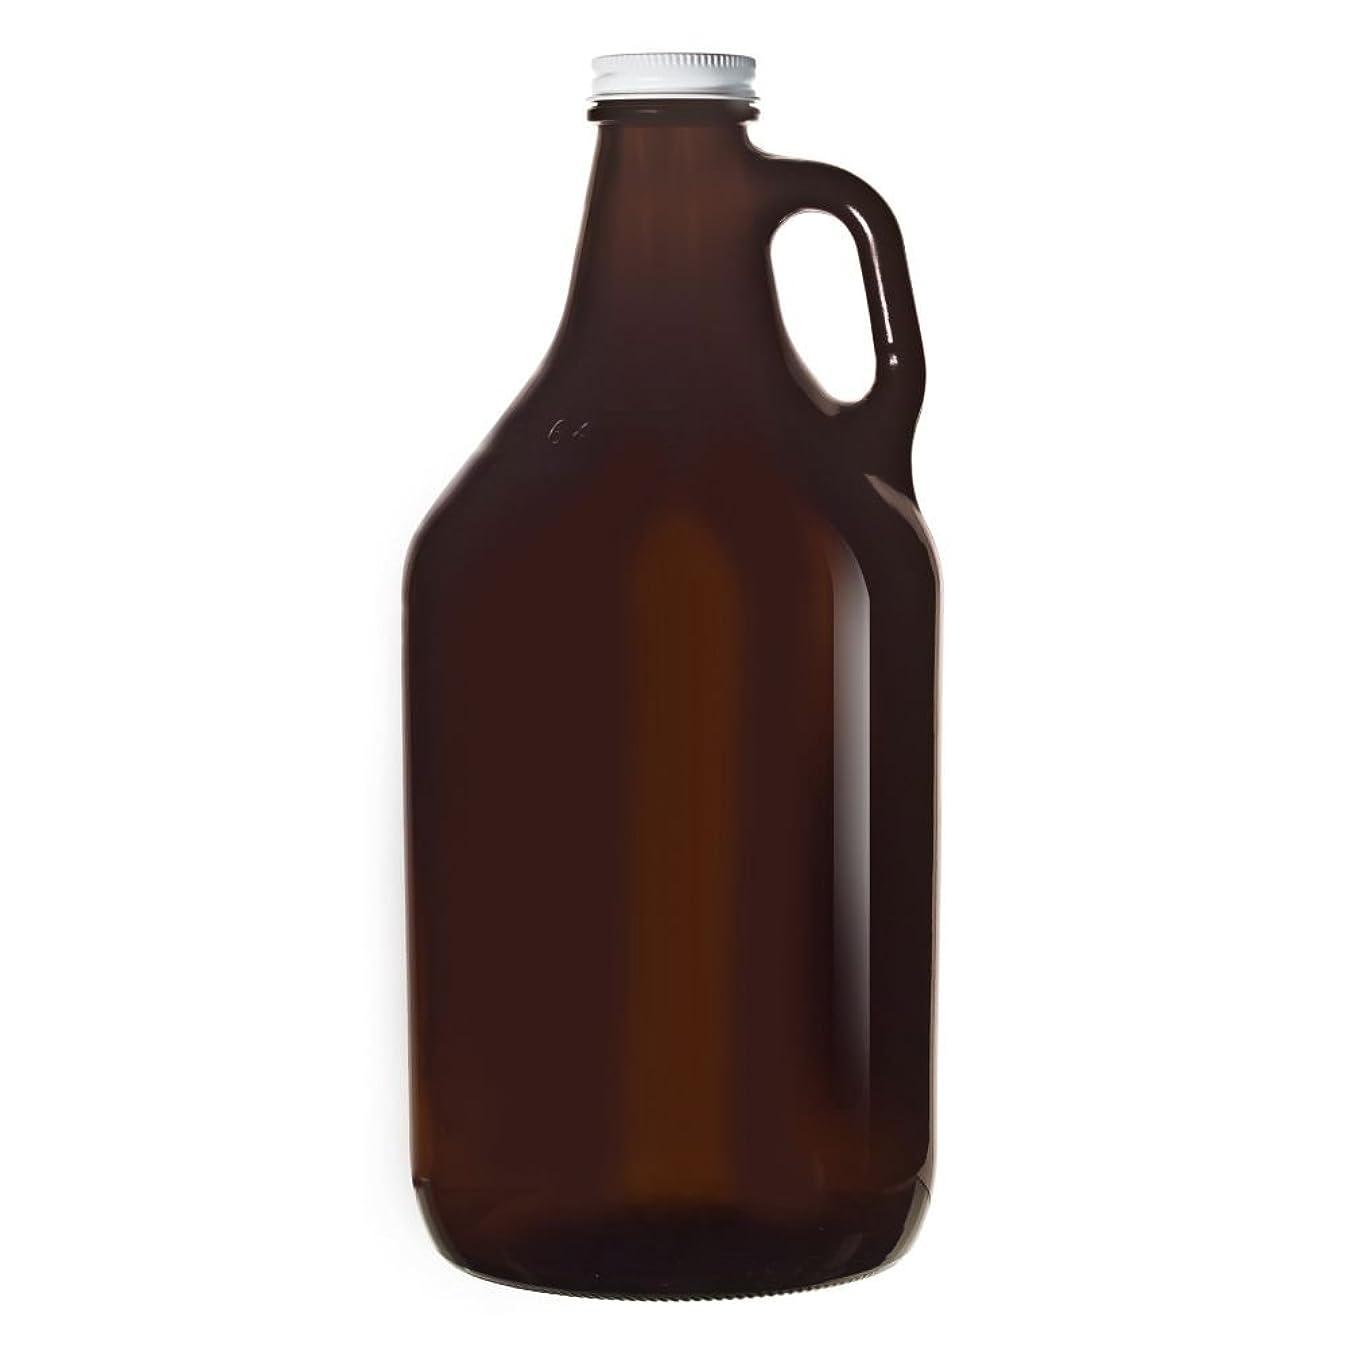 Libbey 70217 Amber Glass 64 Ounce Beer Growler - 6 / CS